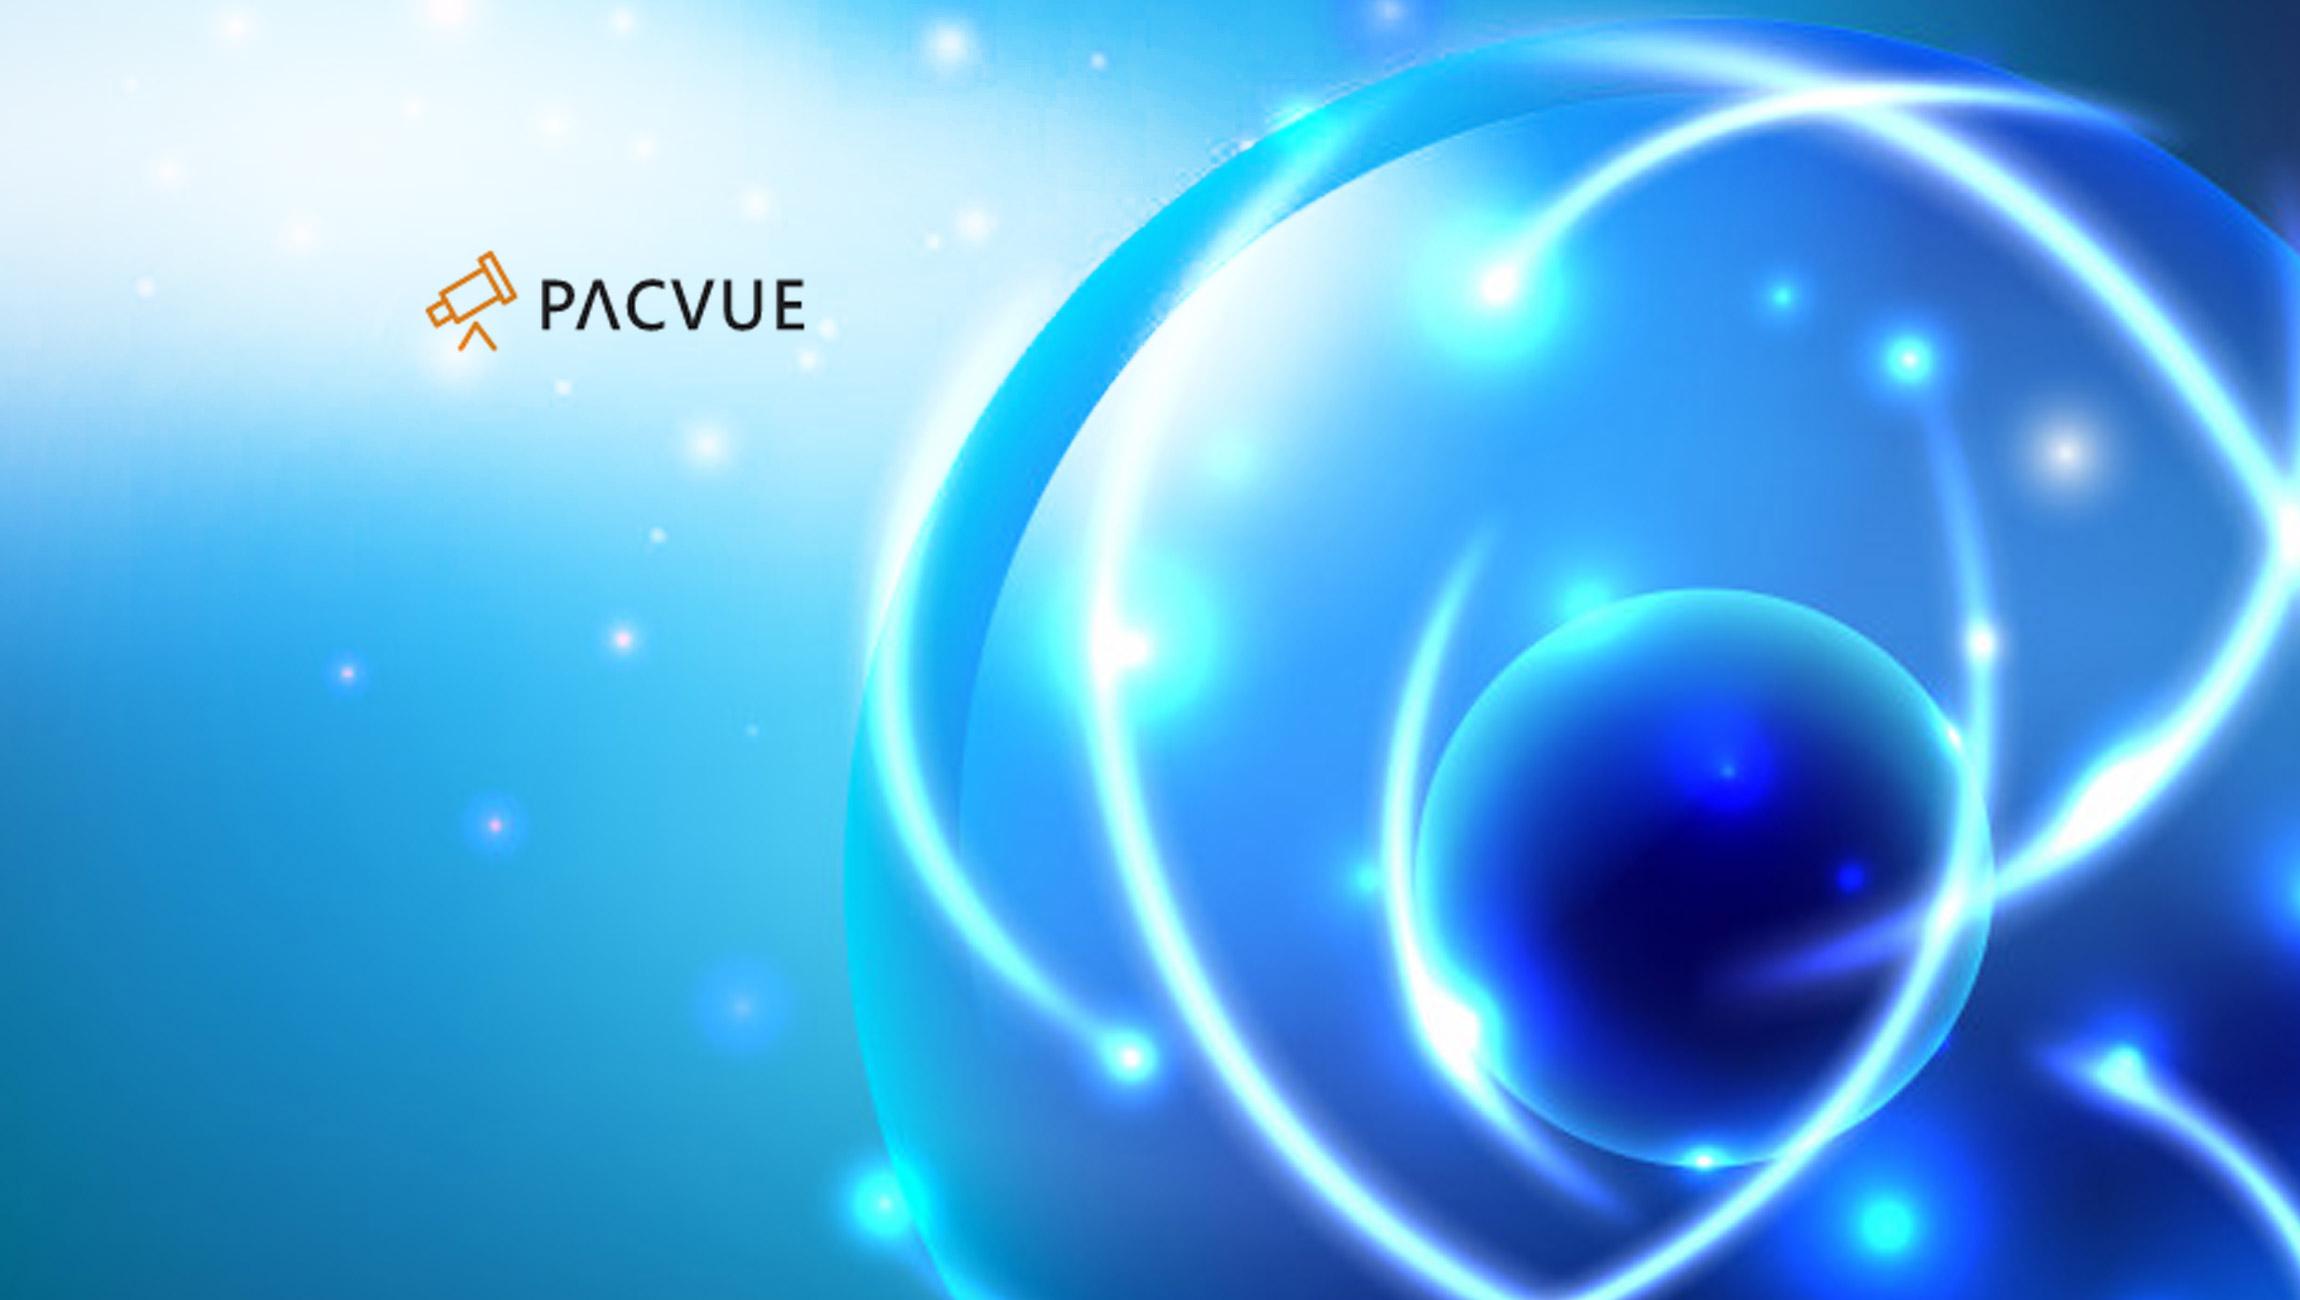 Pacvue Brings its Award Winning eCommerce Advertising and Intelligence Platform to Instacart